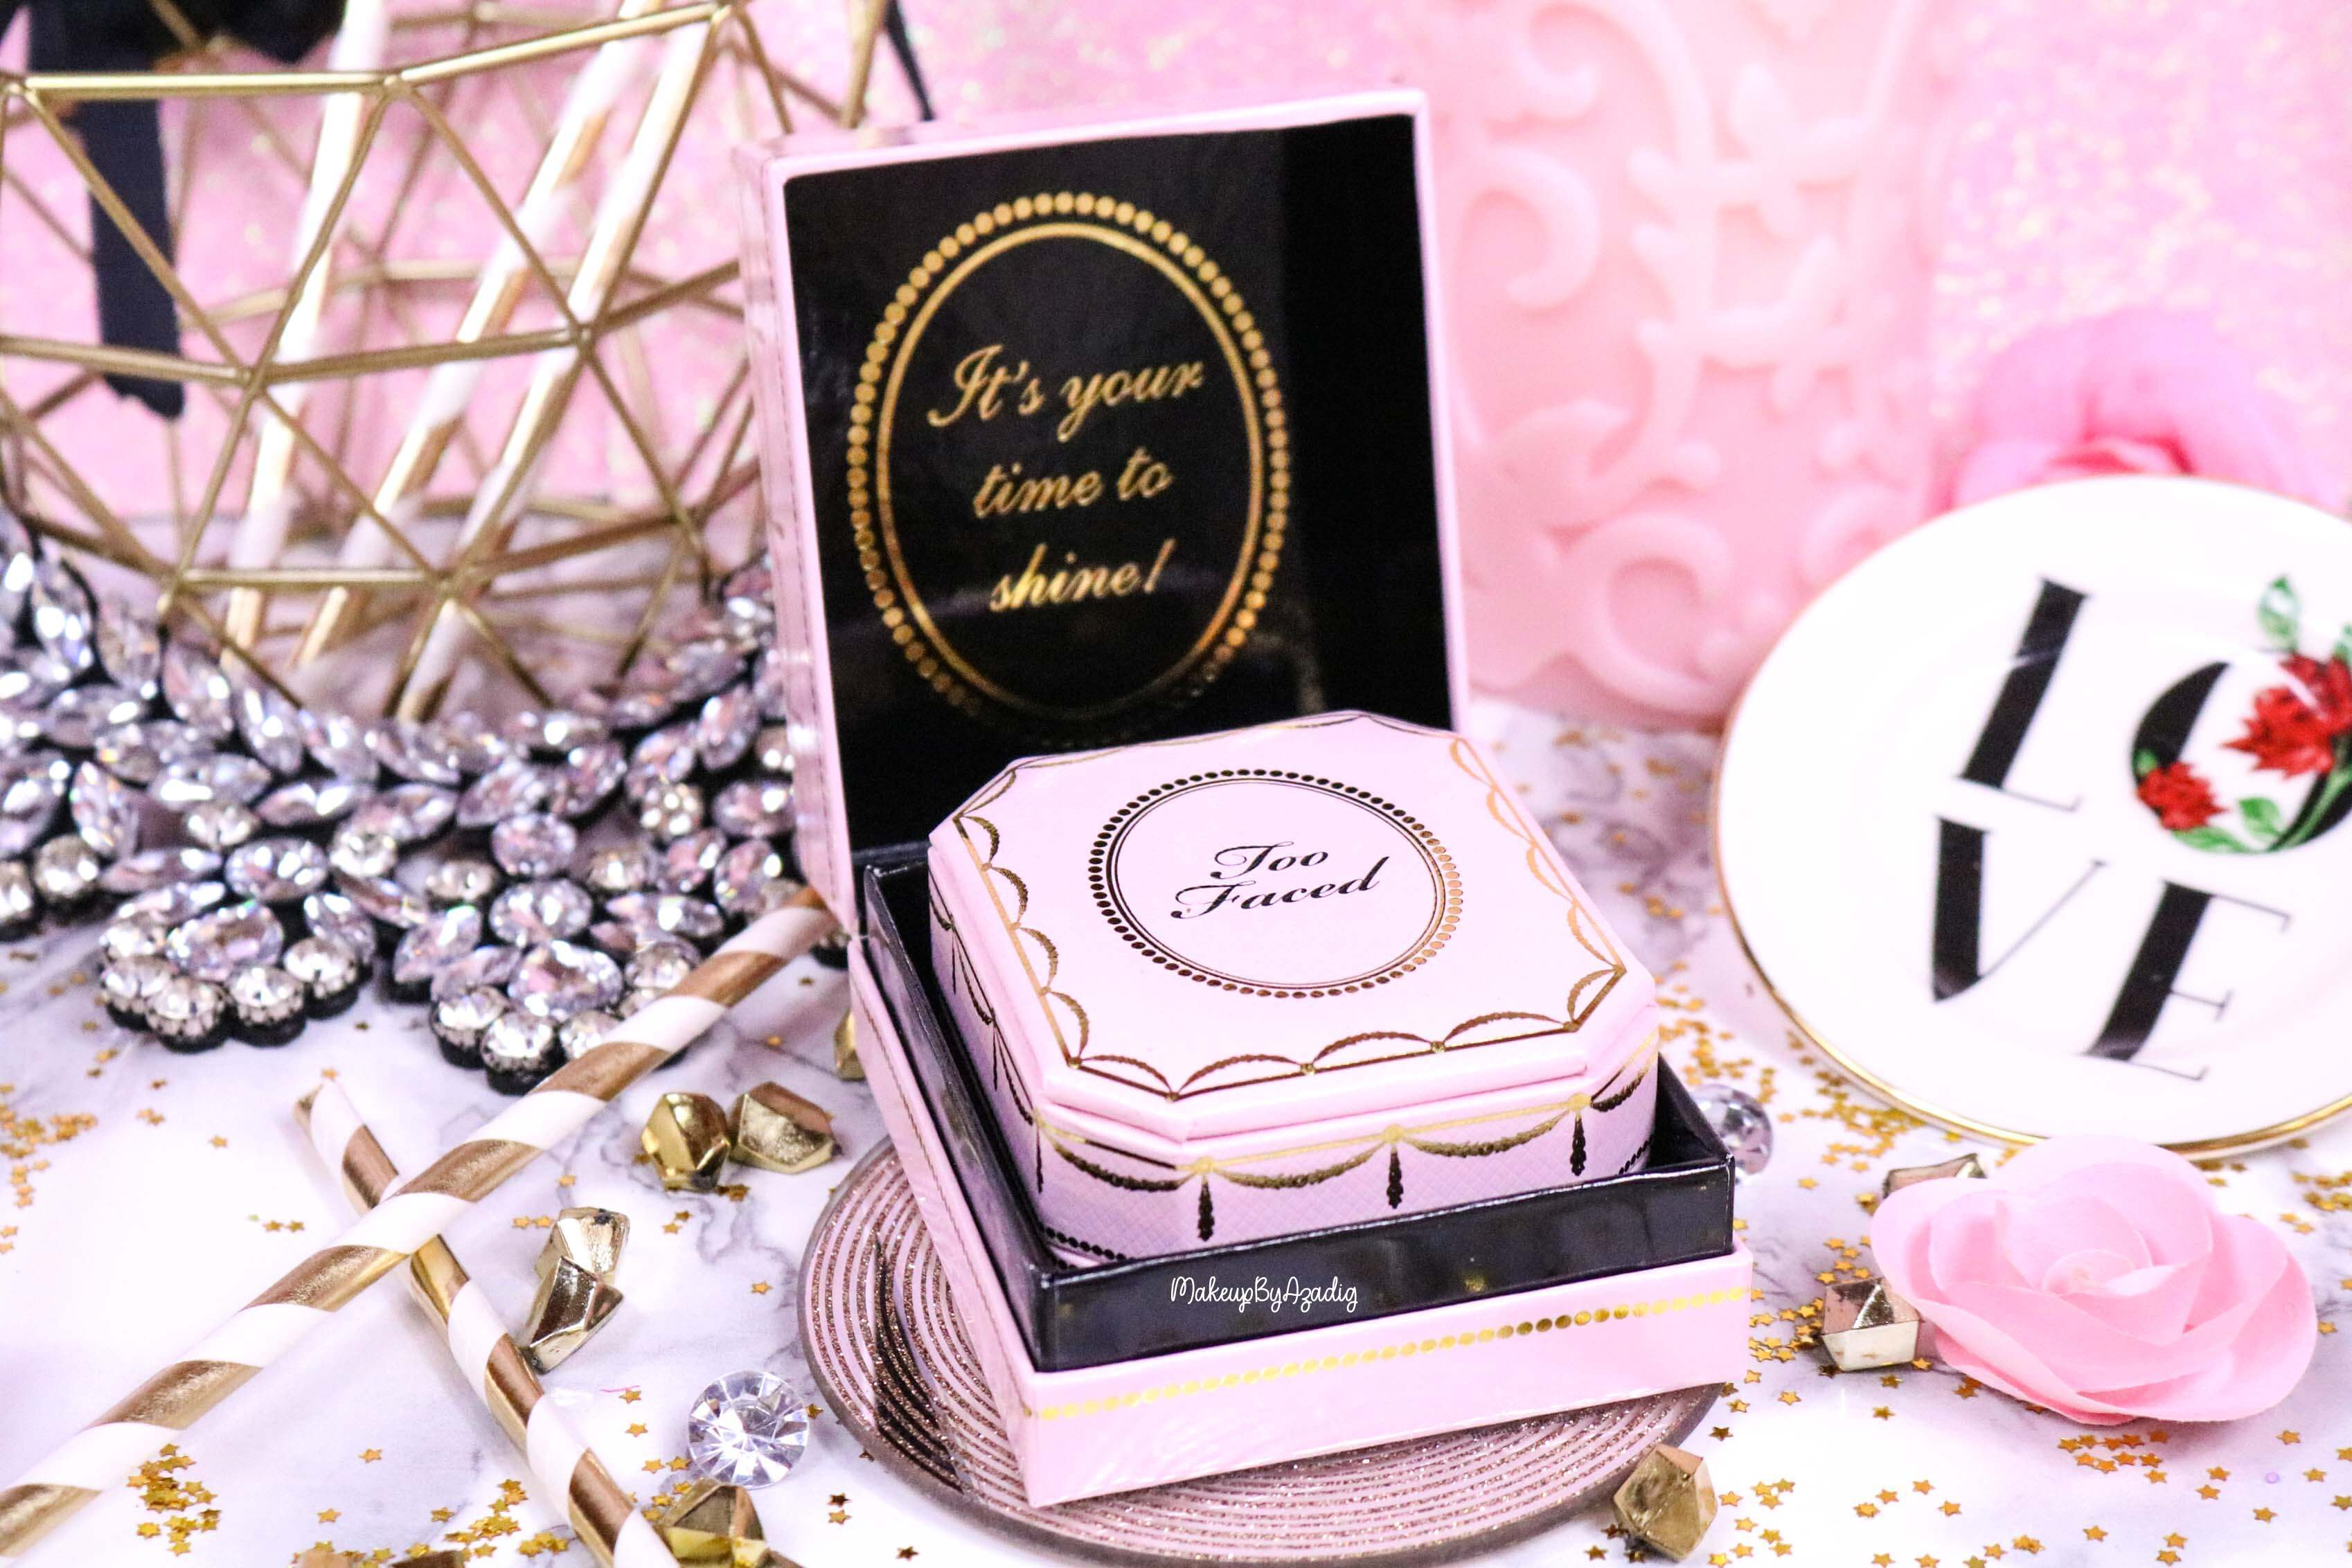 revue-highlighter-diamond-light-toofaced-enlumineur-diamant-collection-makeup-makeupbyazadig-sortie-france-influencer-swatch-avis-prix-shine